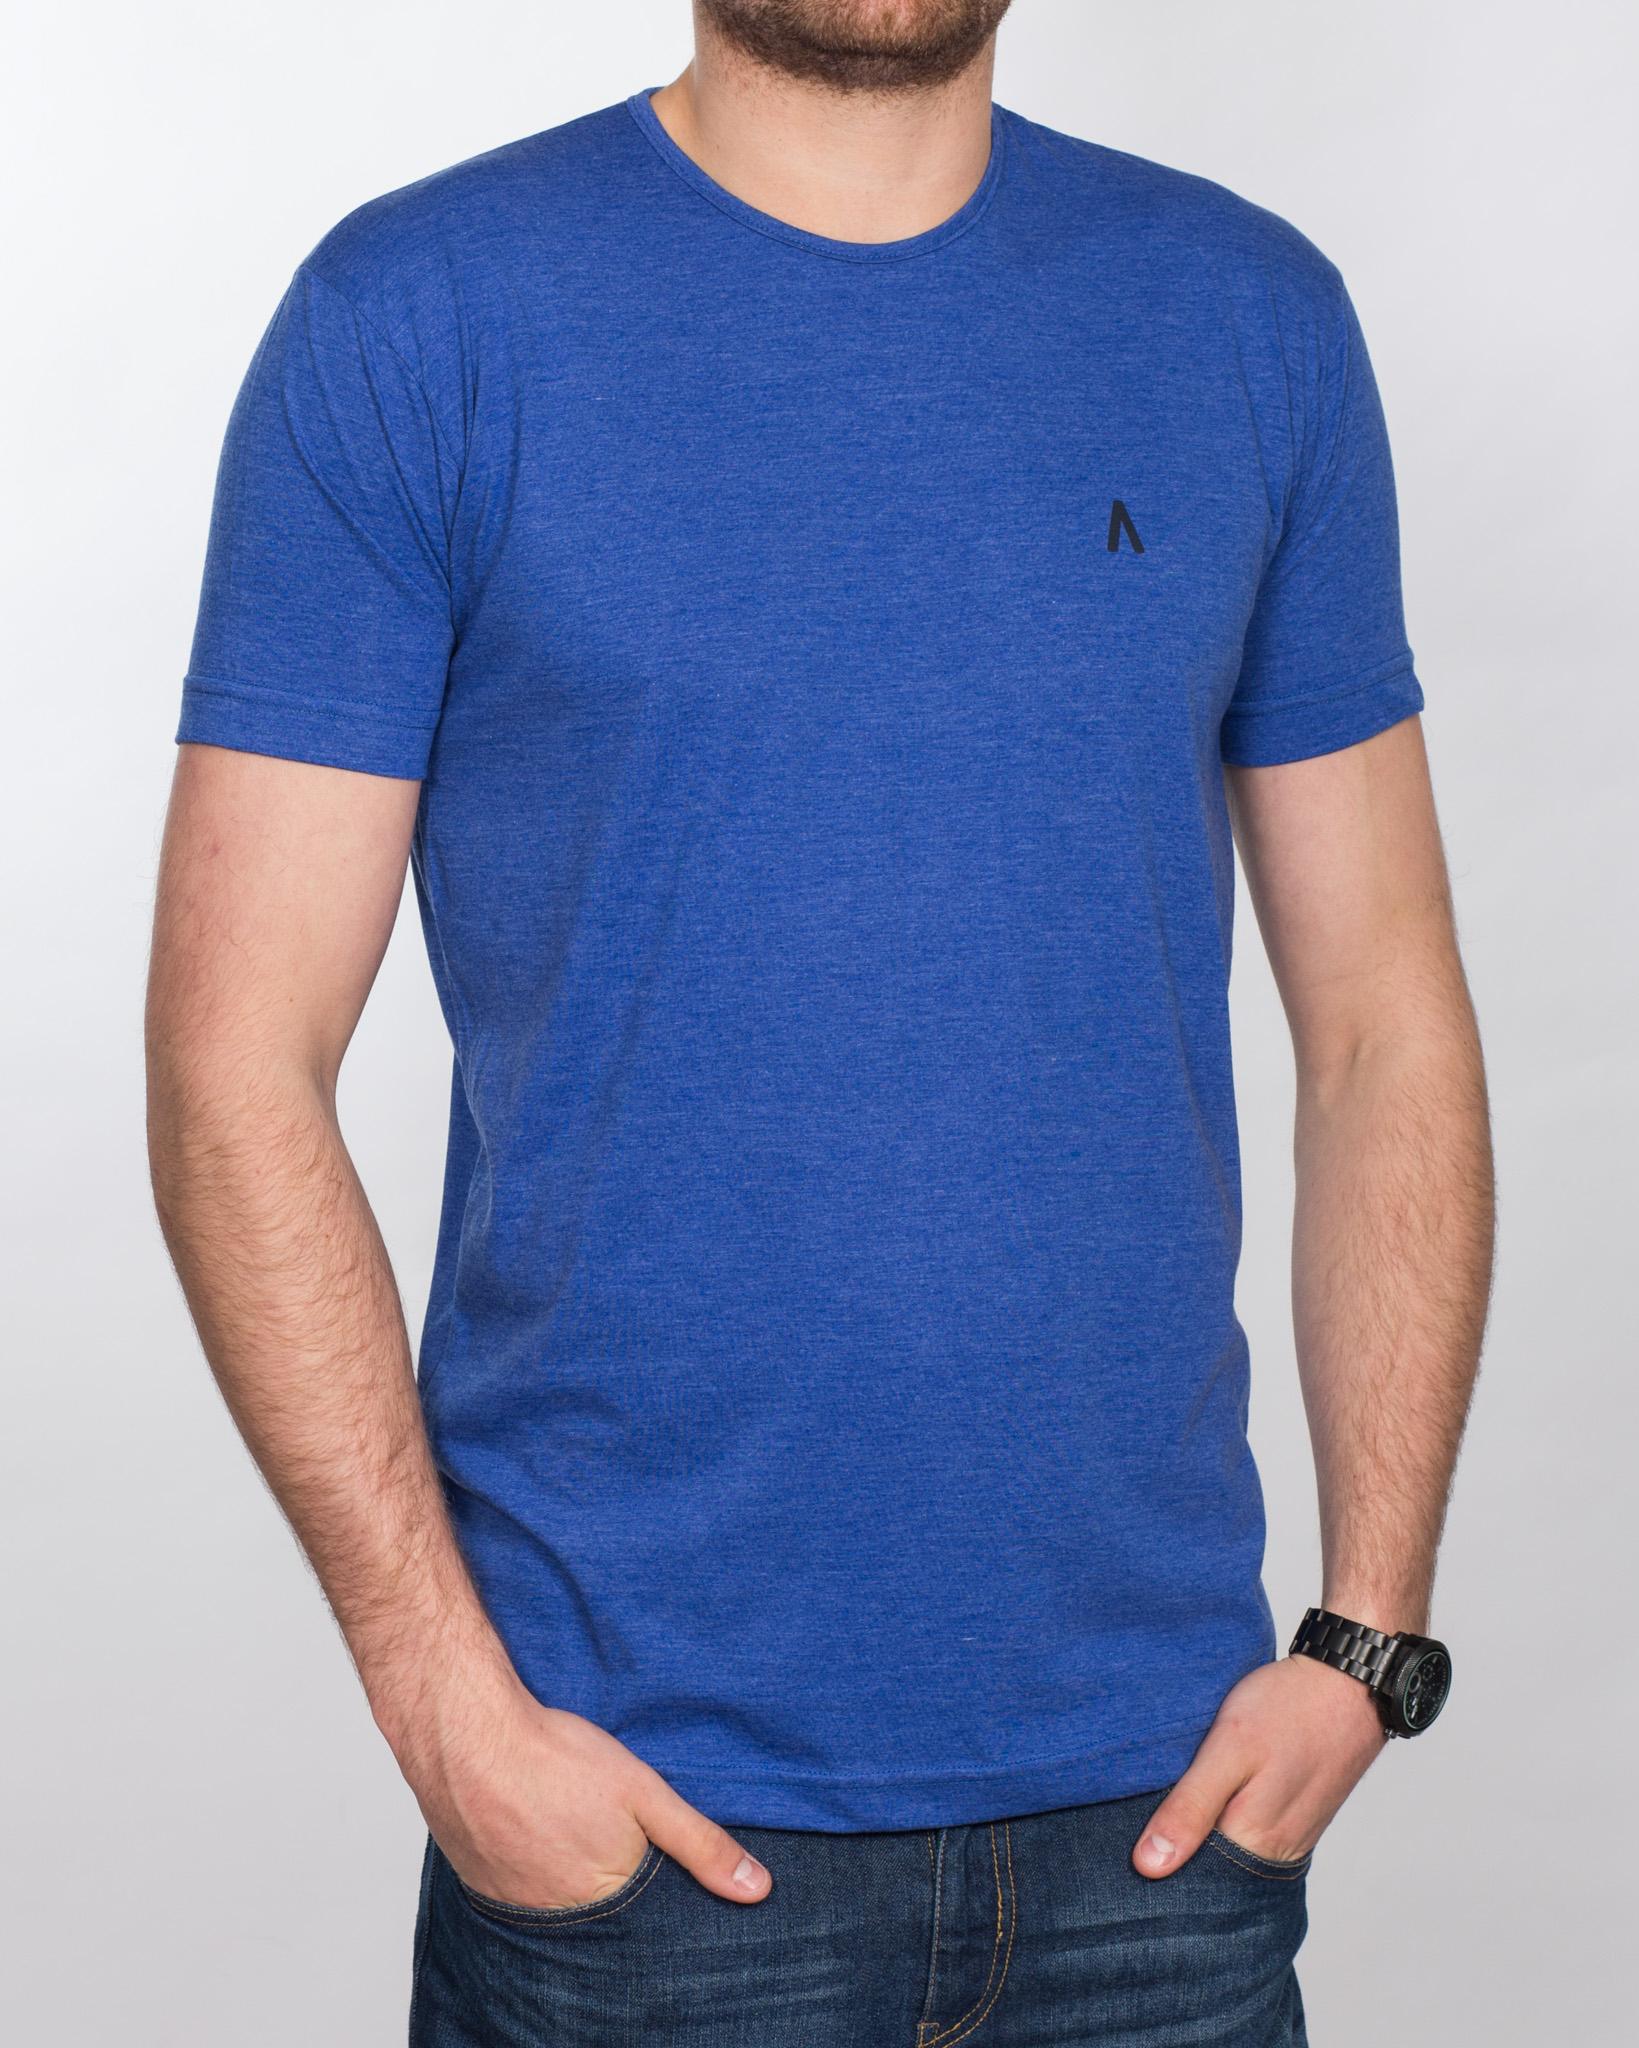 2t Tall T-Shirt (blue)